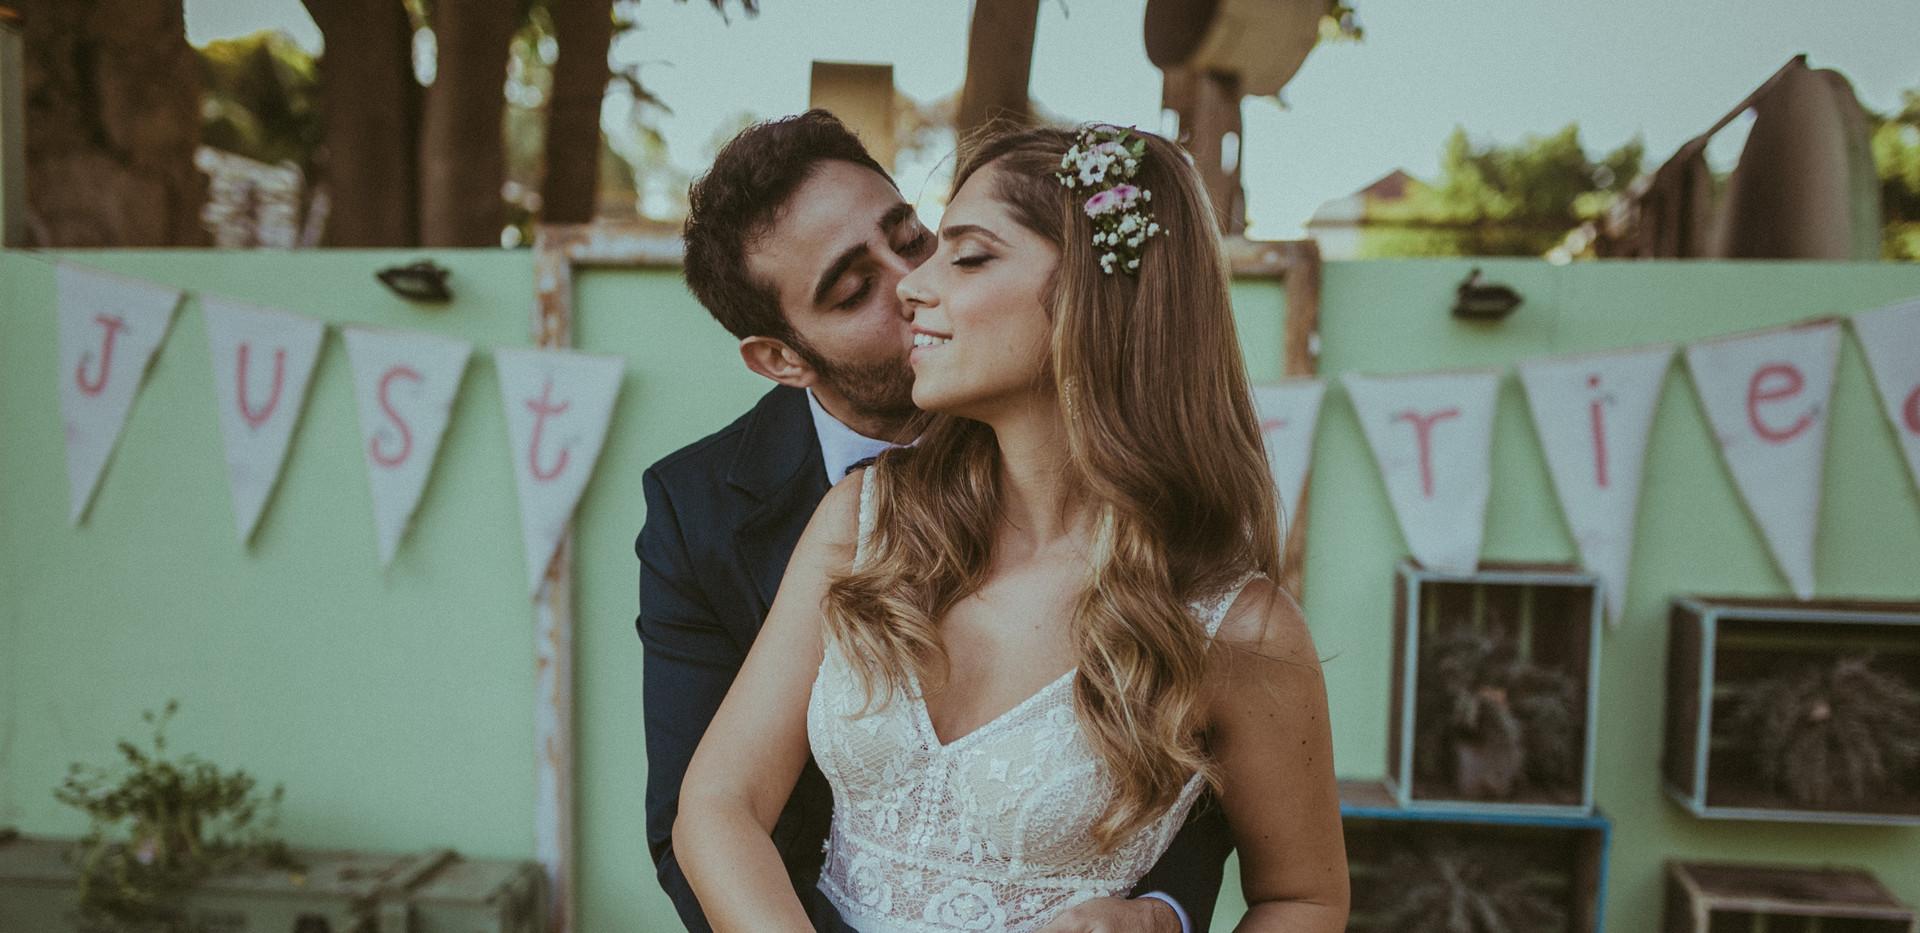 Adva & Tomer The Wedding-108.jpg